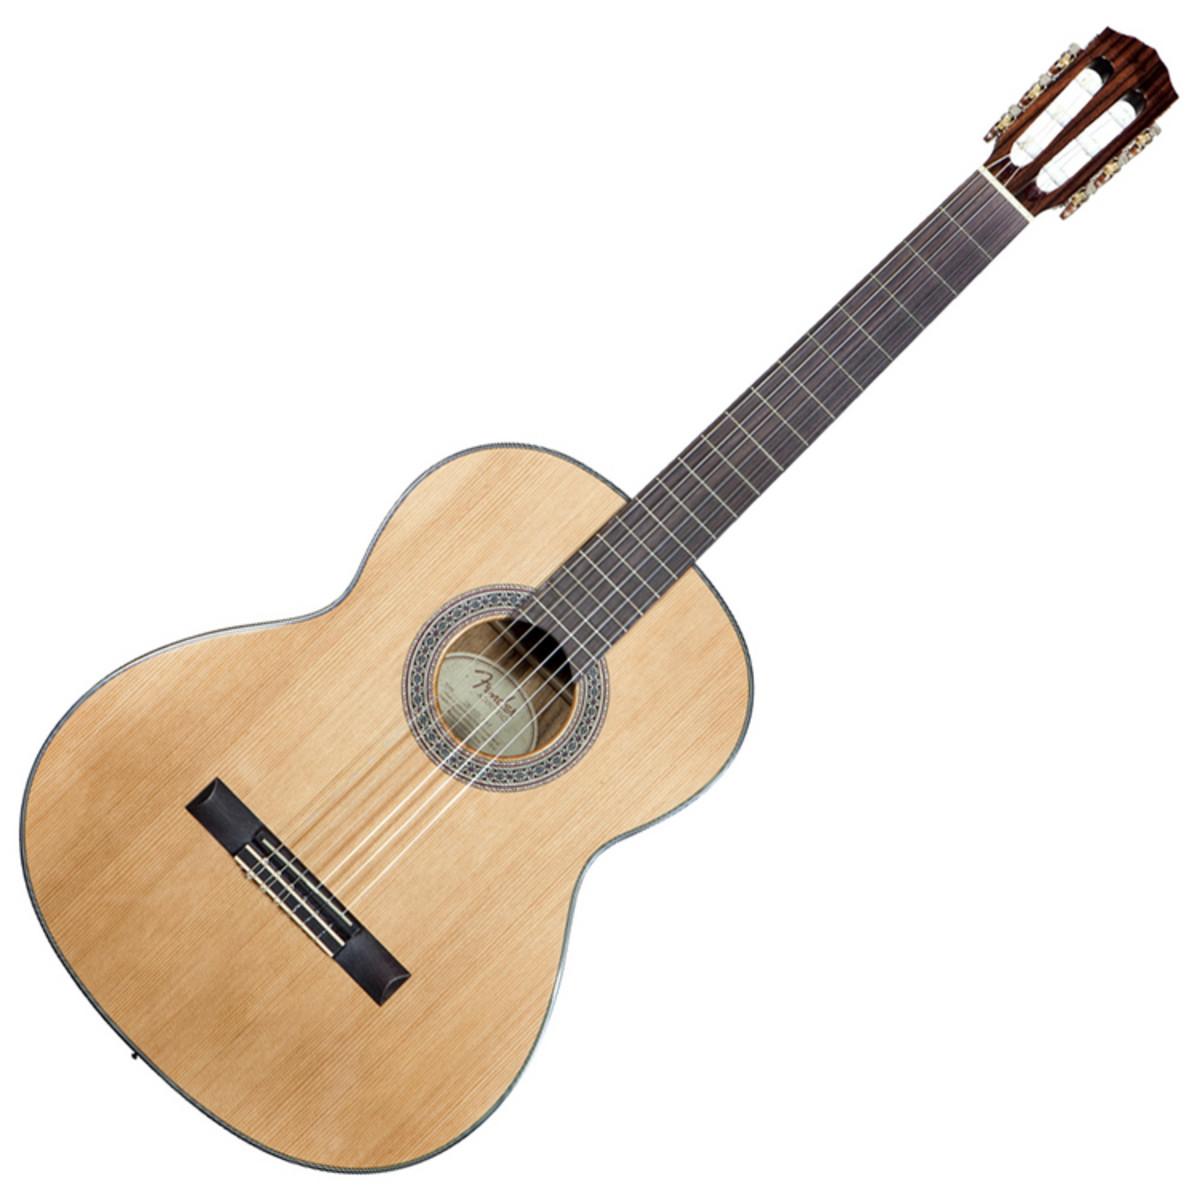 fender cn 140s guitare classique naturel. Black Bedroom Furniture Sets. Home Design Ideas